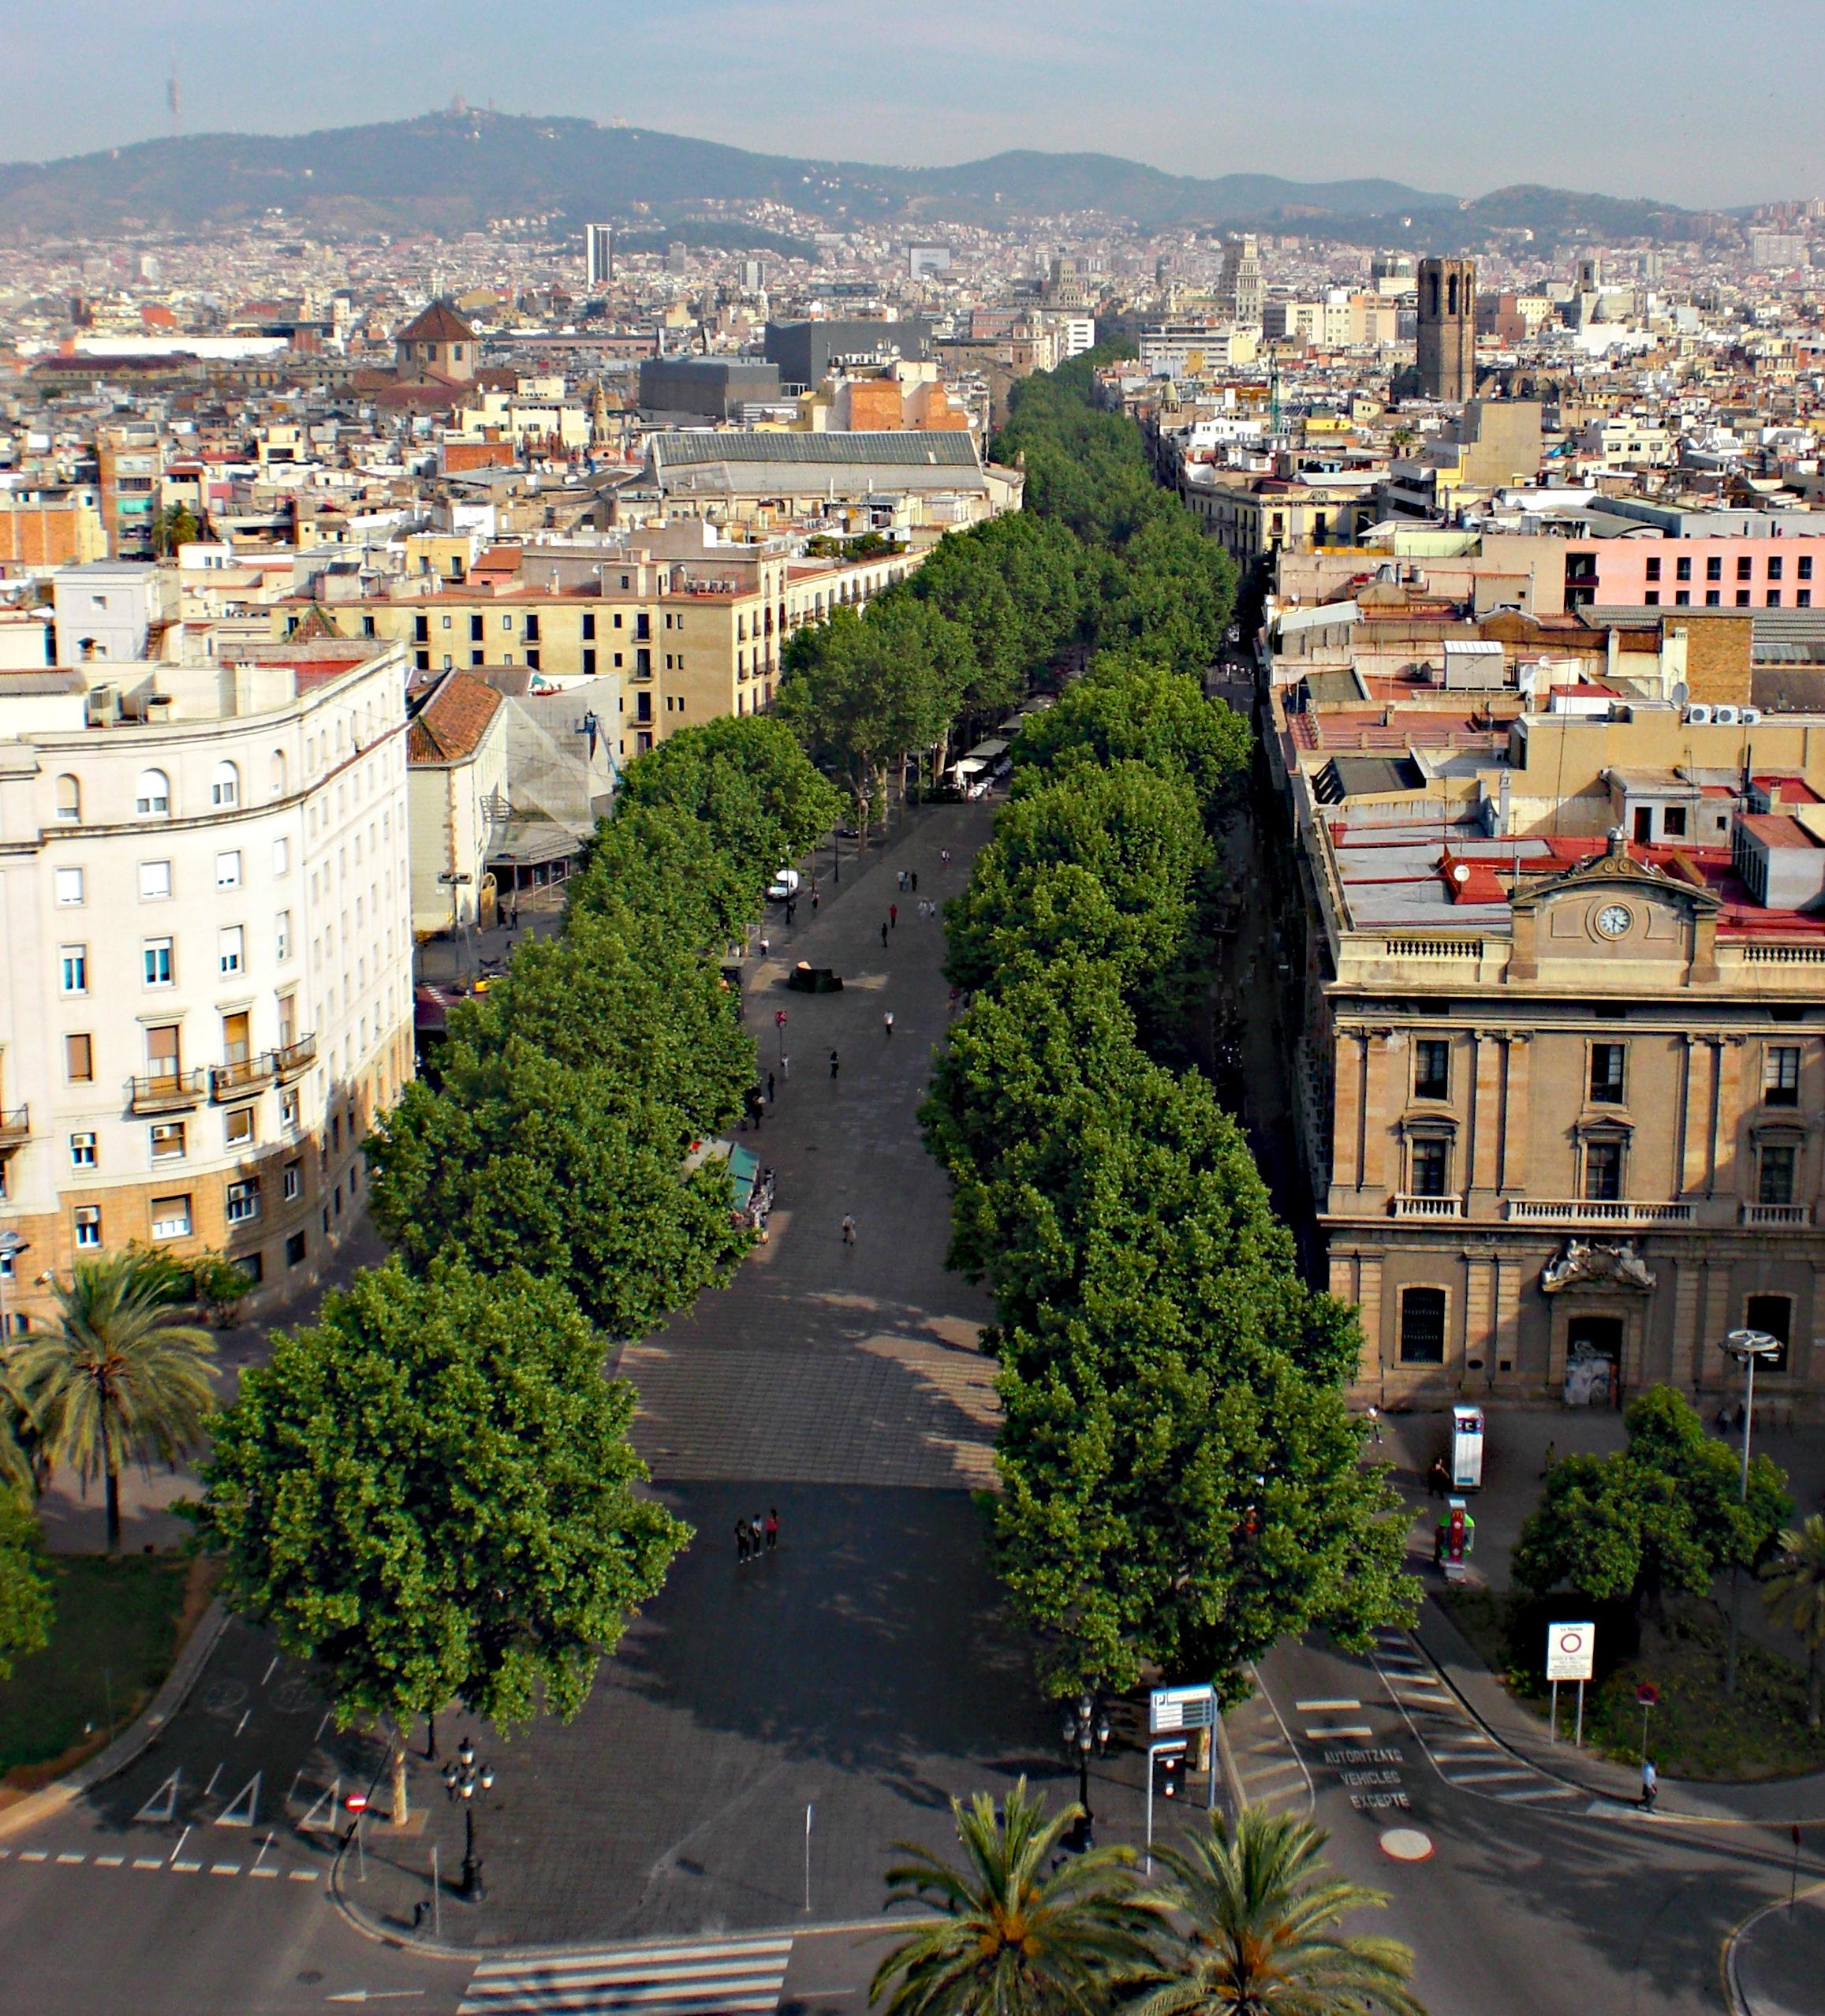 Barcelona City: Today's Travel Destination: Barcelona, Spain